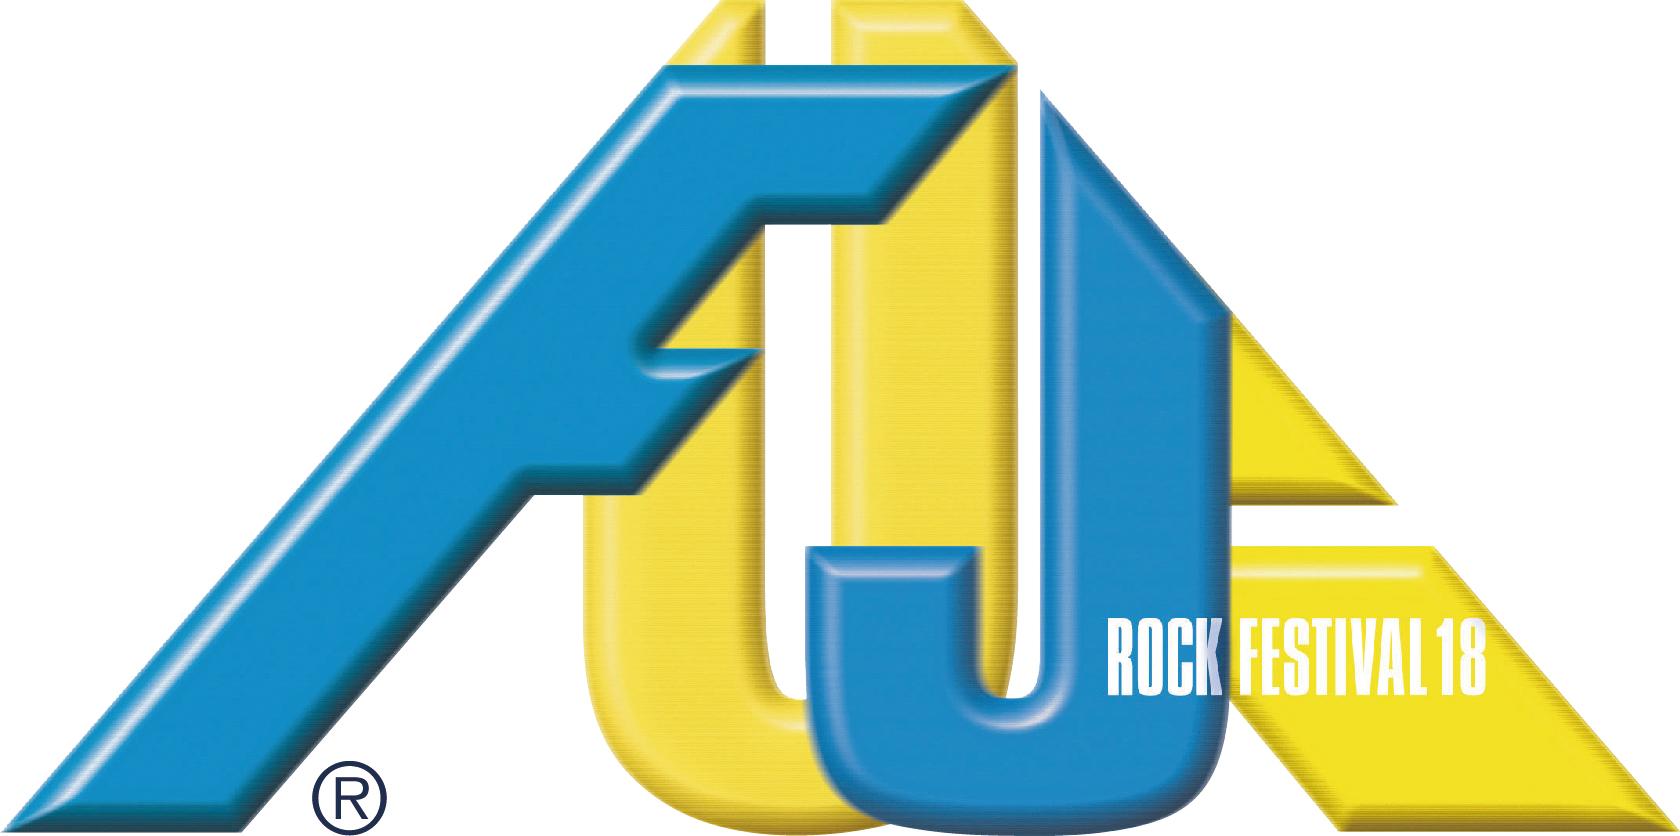 FRF18_Visual_logo.jpg